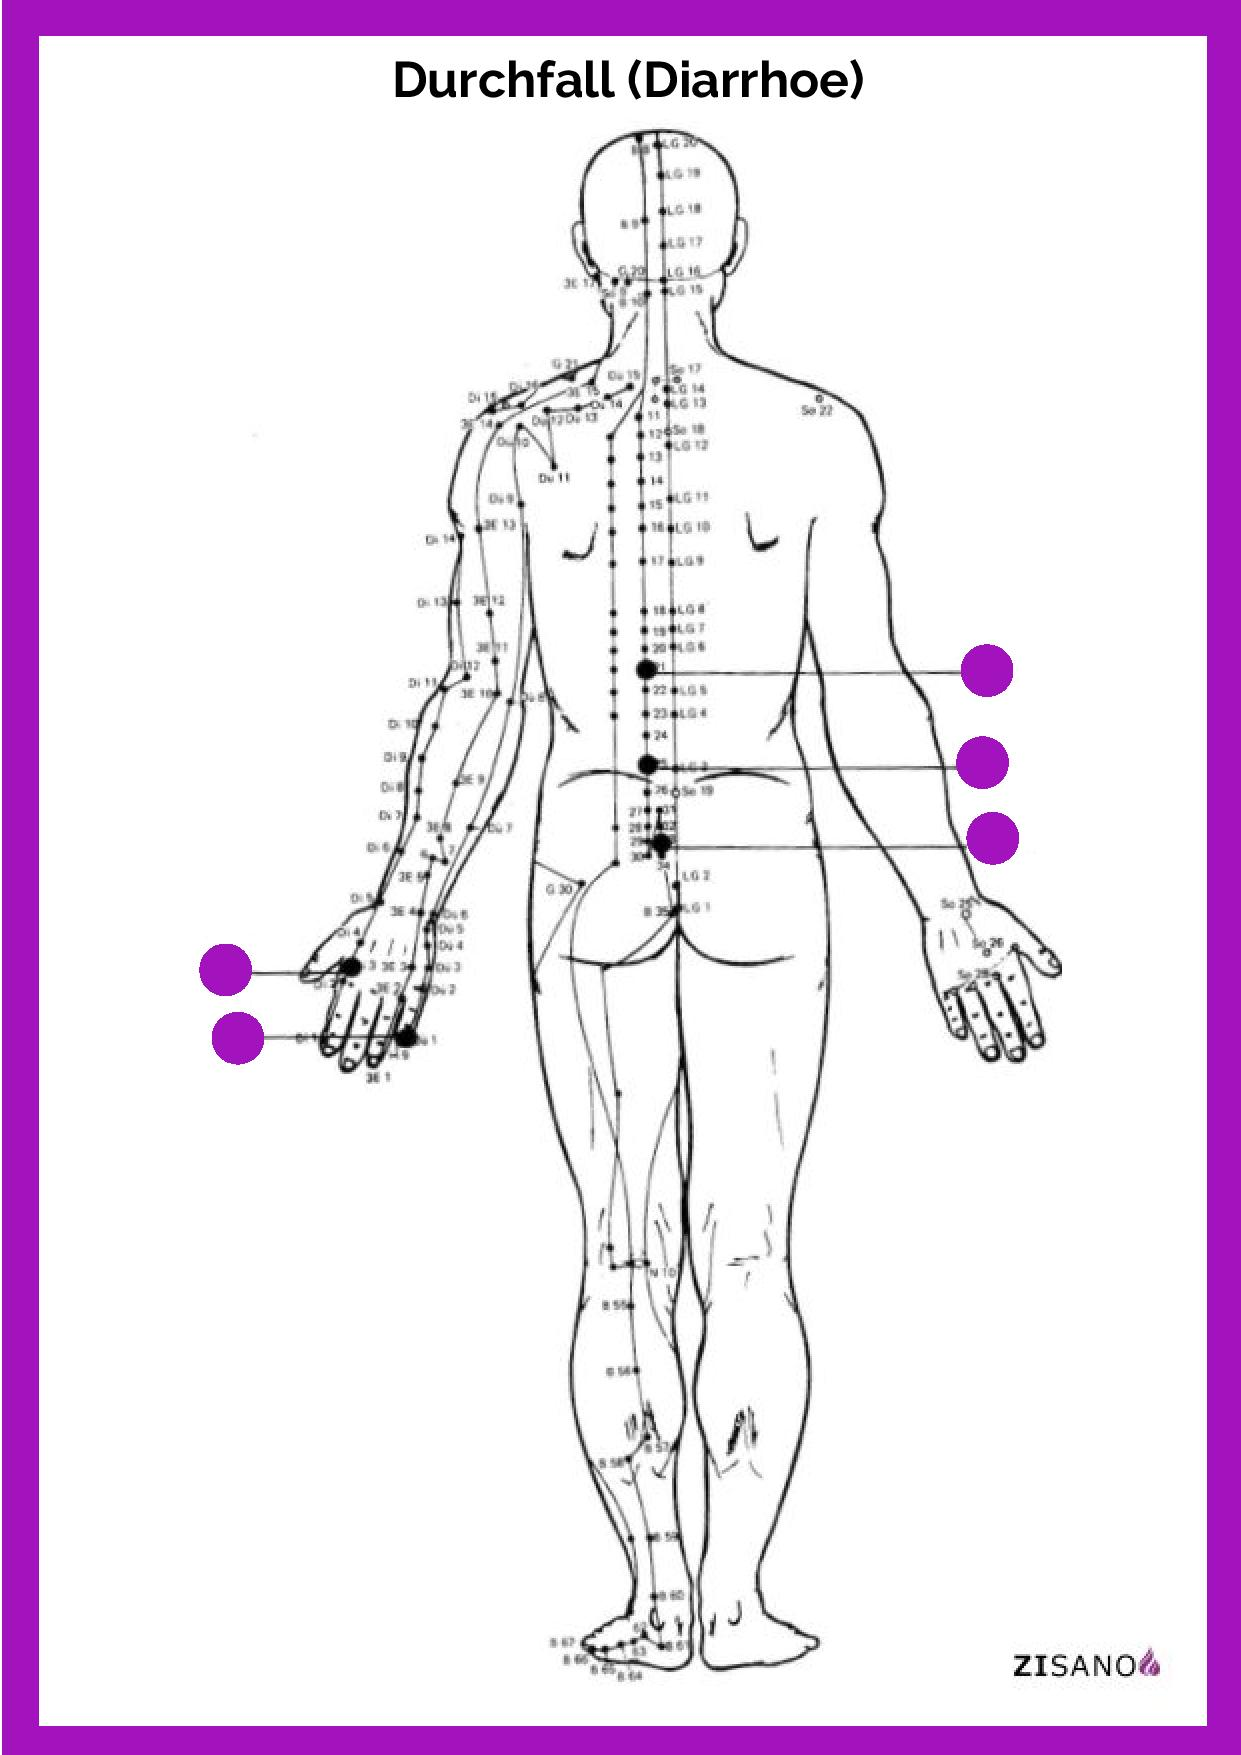 Meridiane - Durchfall (Diarrhoe)- Behandlung